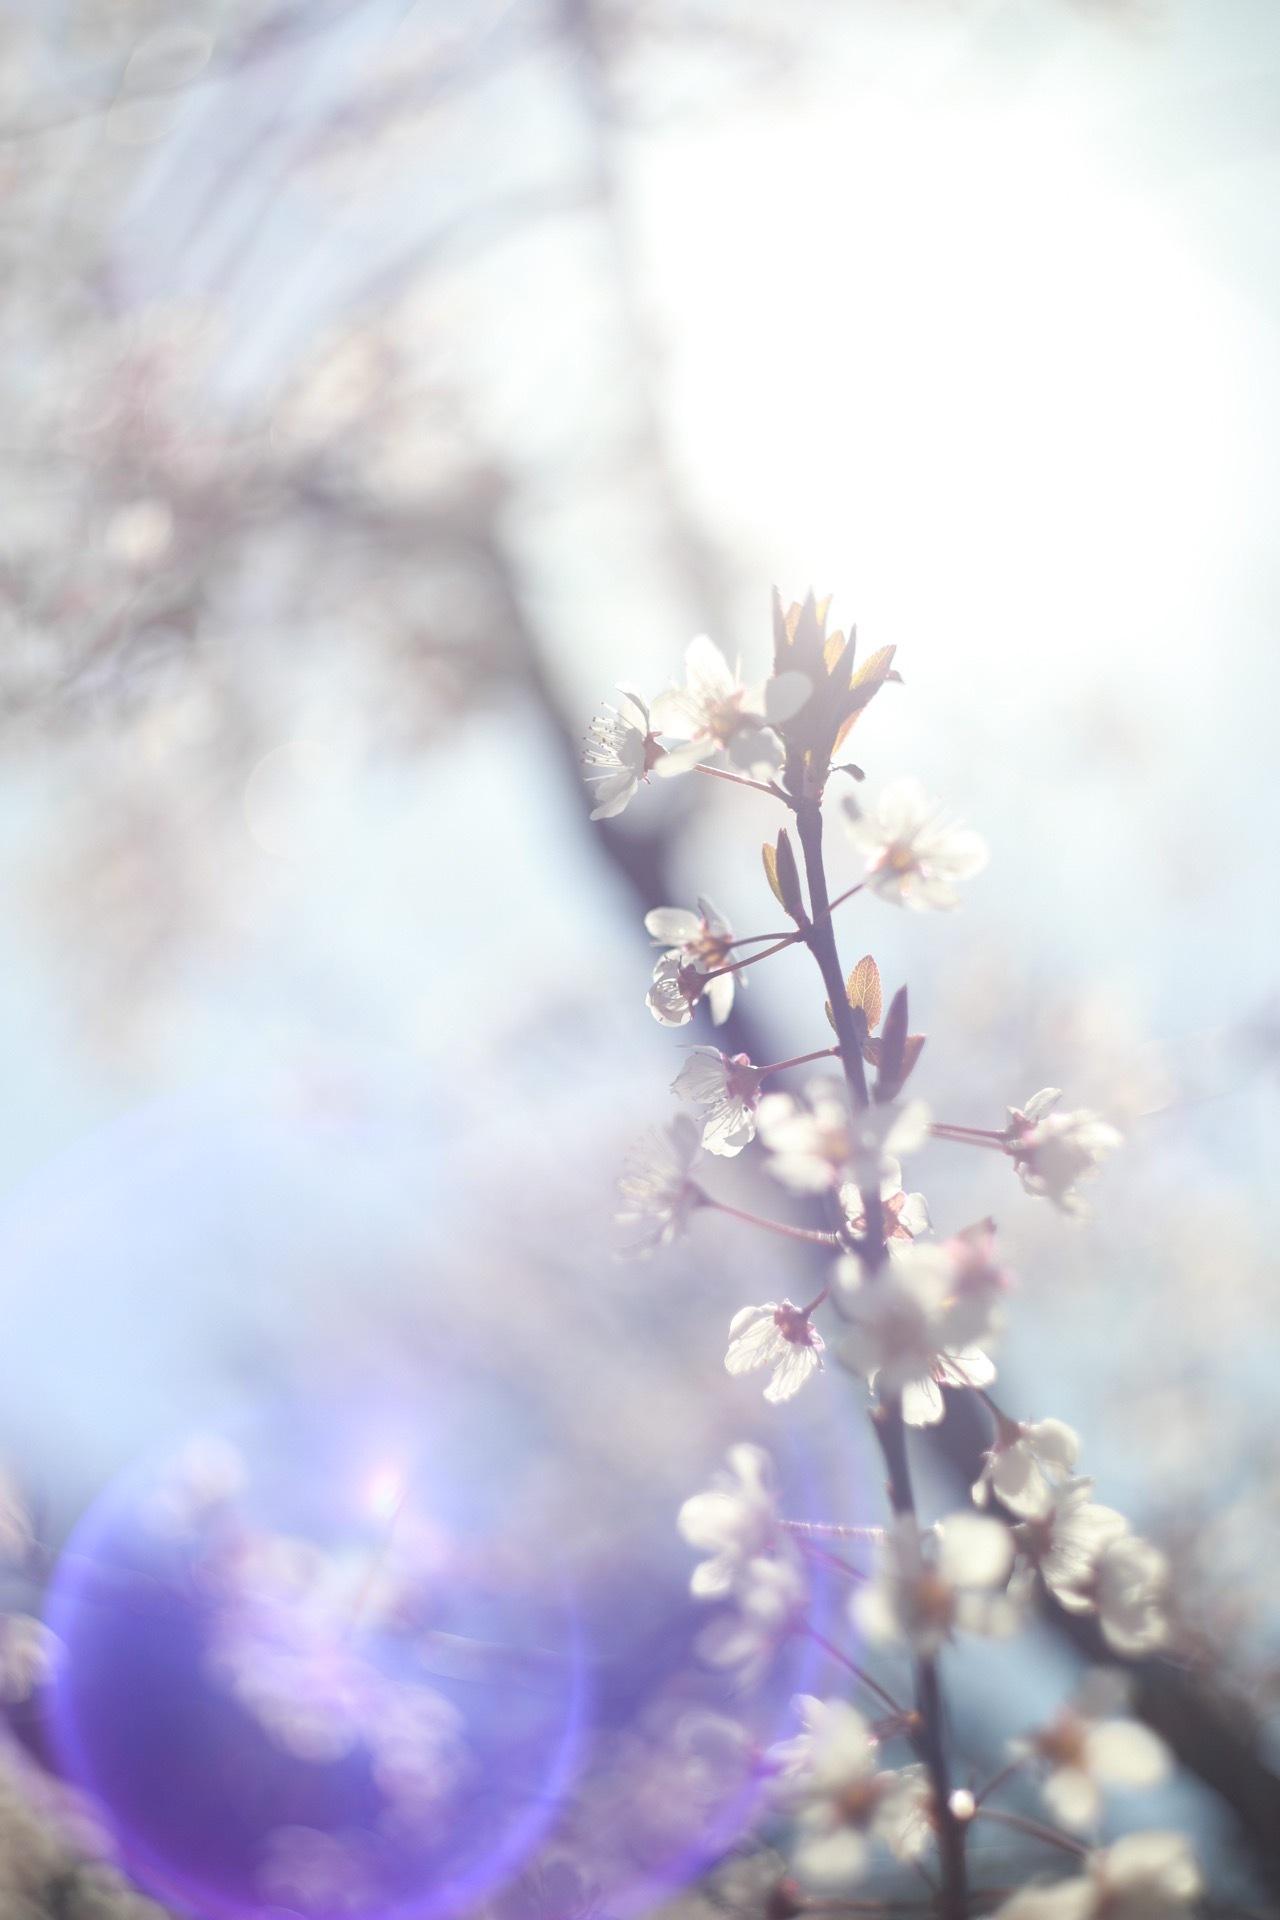 Spring come by Hidekazu Shitagami